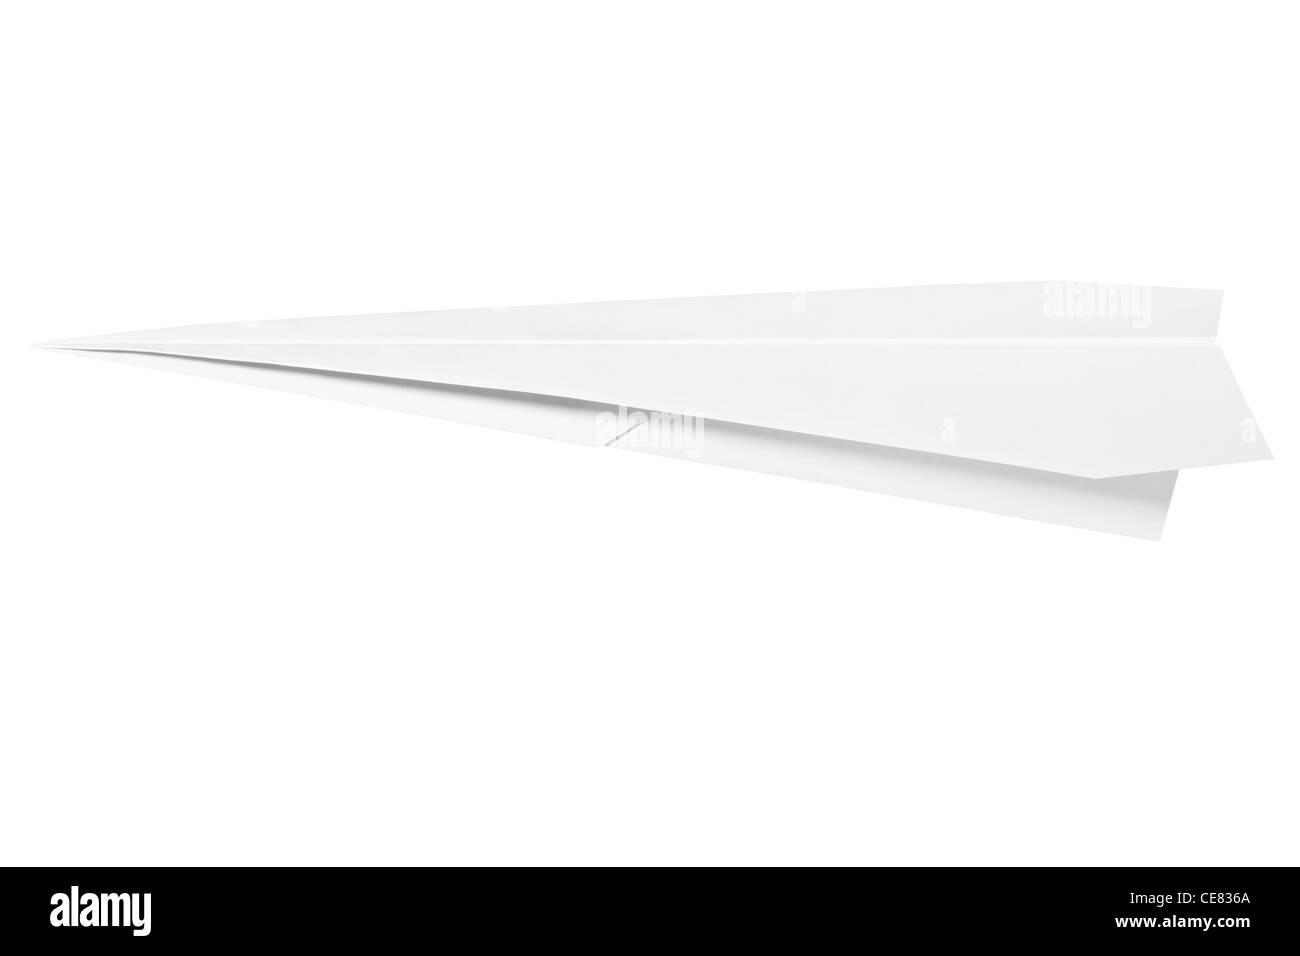 Paper plane - Stock Image